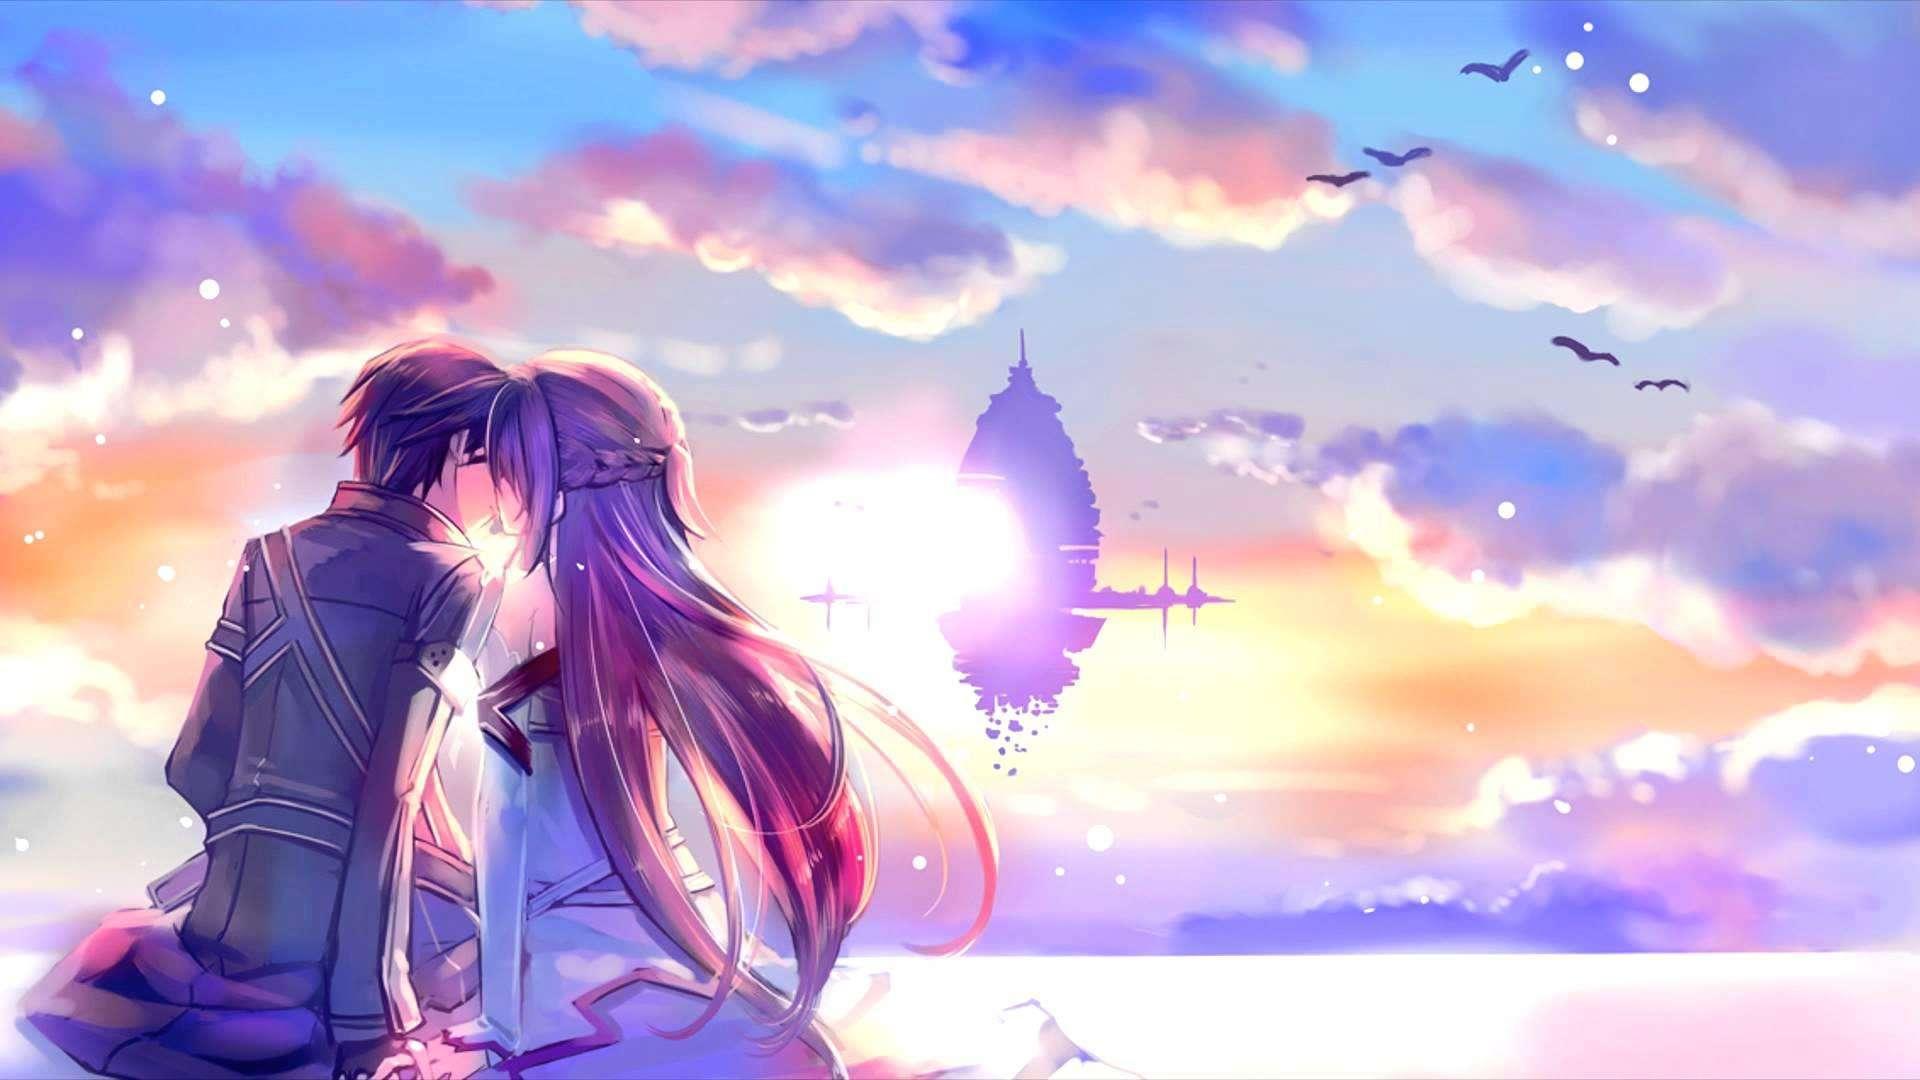 Hd Wallpapers Anime Love Impremedia Net